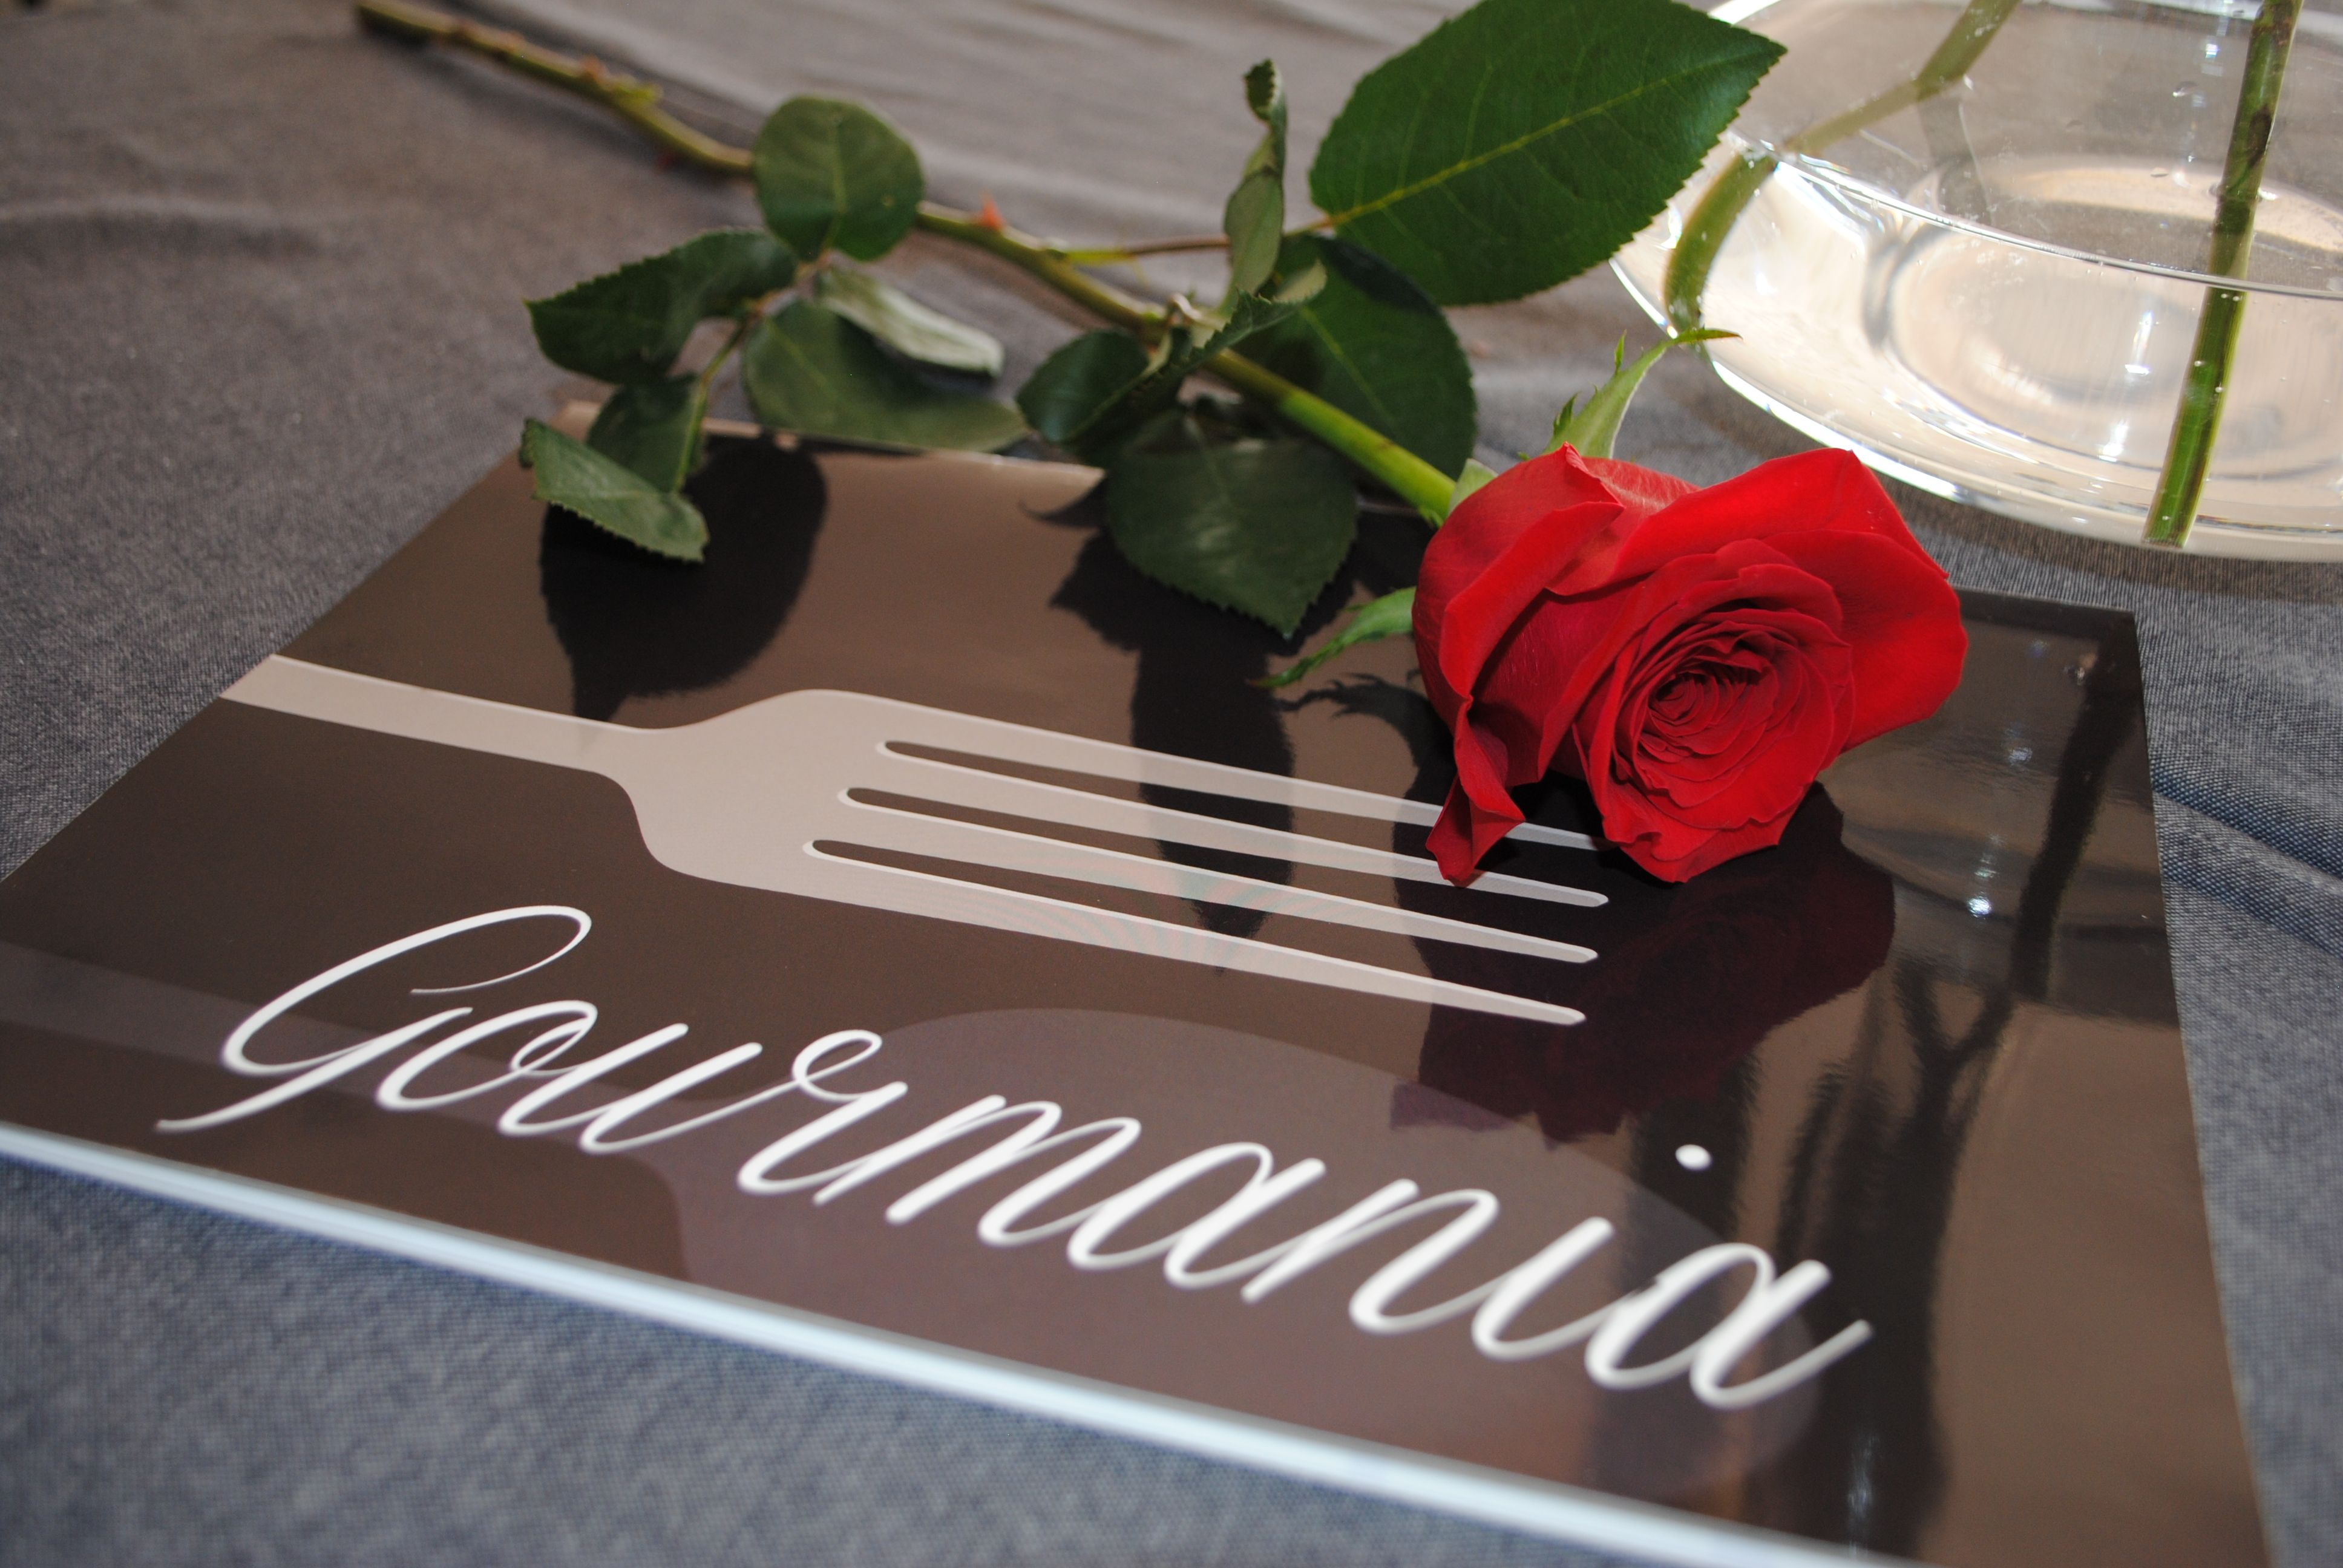 En Gourmania cuidamos todos los pequeños detalles, especialmente en fechas señaladas. // In Gourmania restaurant, we care for all the little details, specially on notable dates.